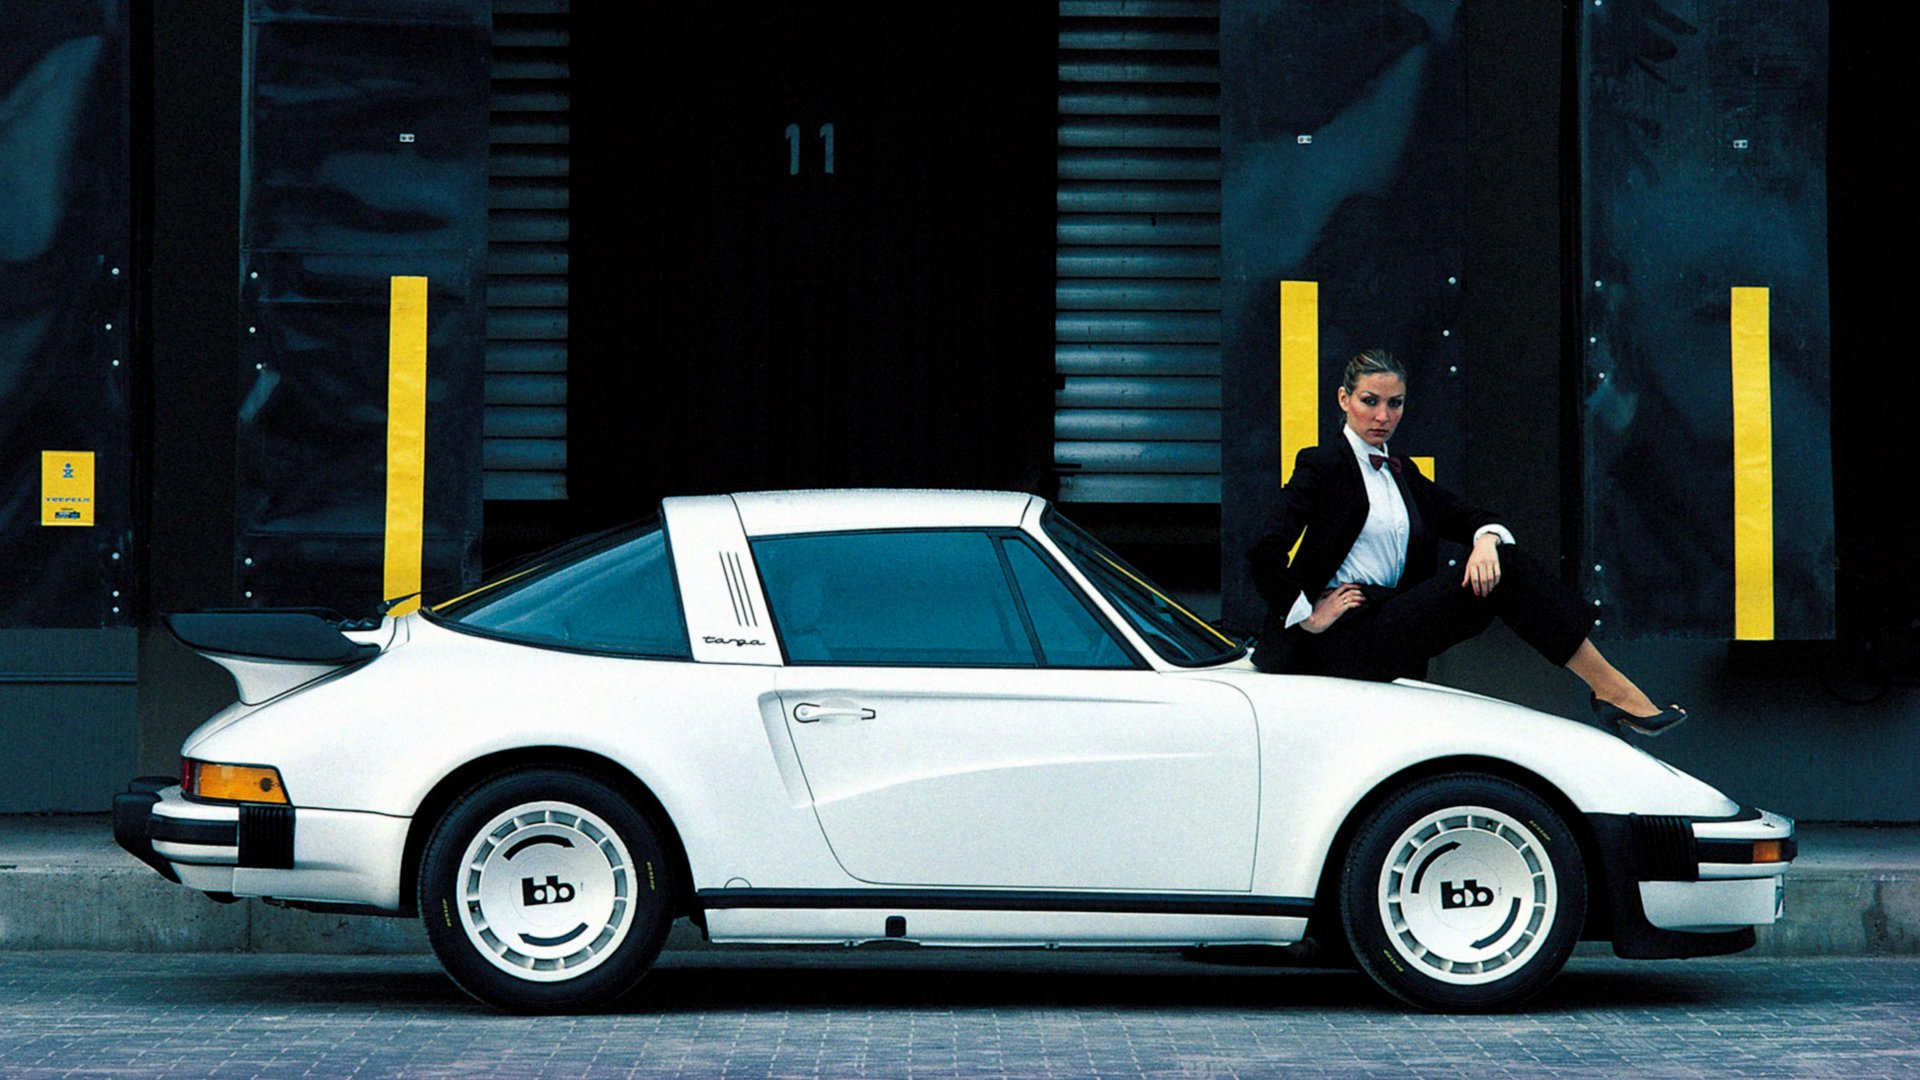 1920x1080 Wallpaper Cars Bb Porsche Turbo Targa White 911 Supercar Wallpaper